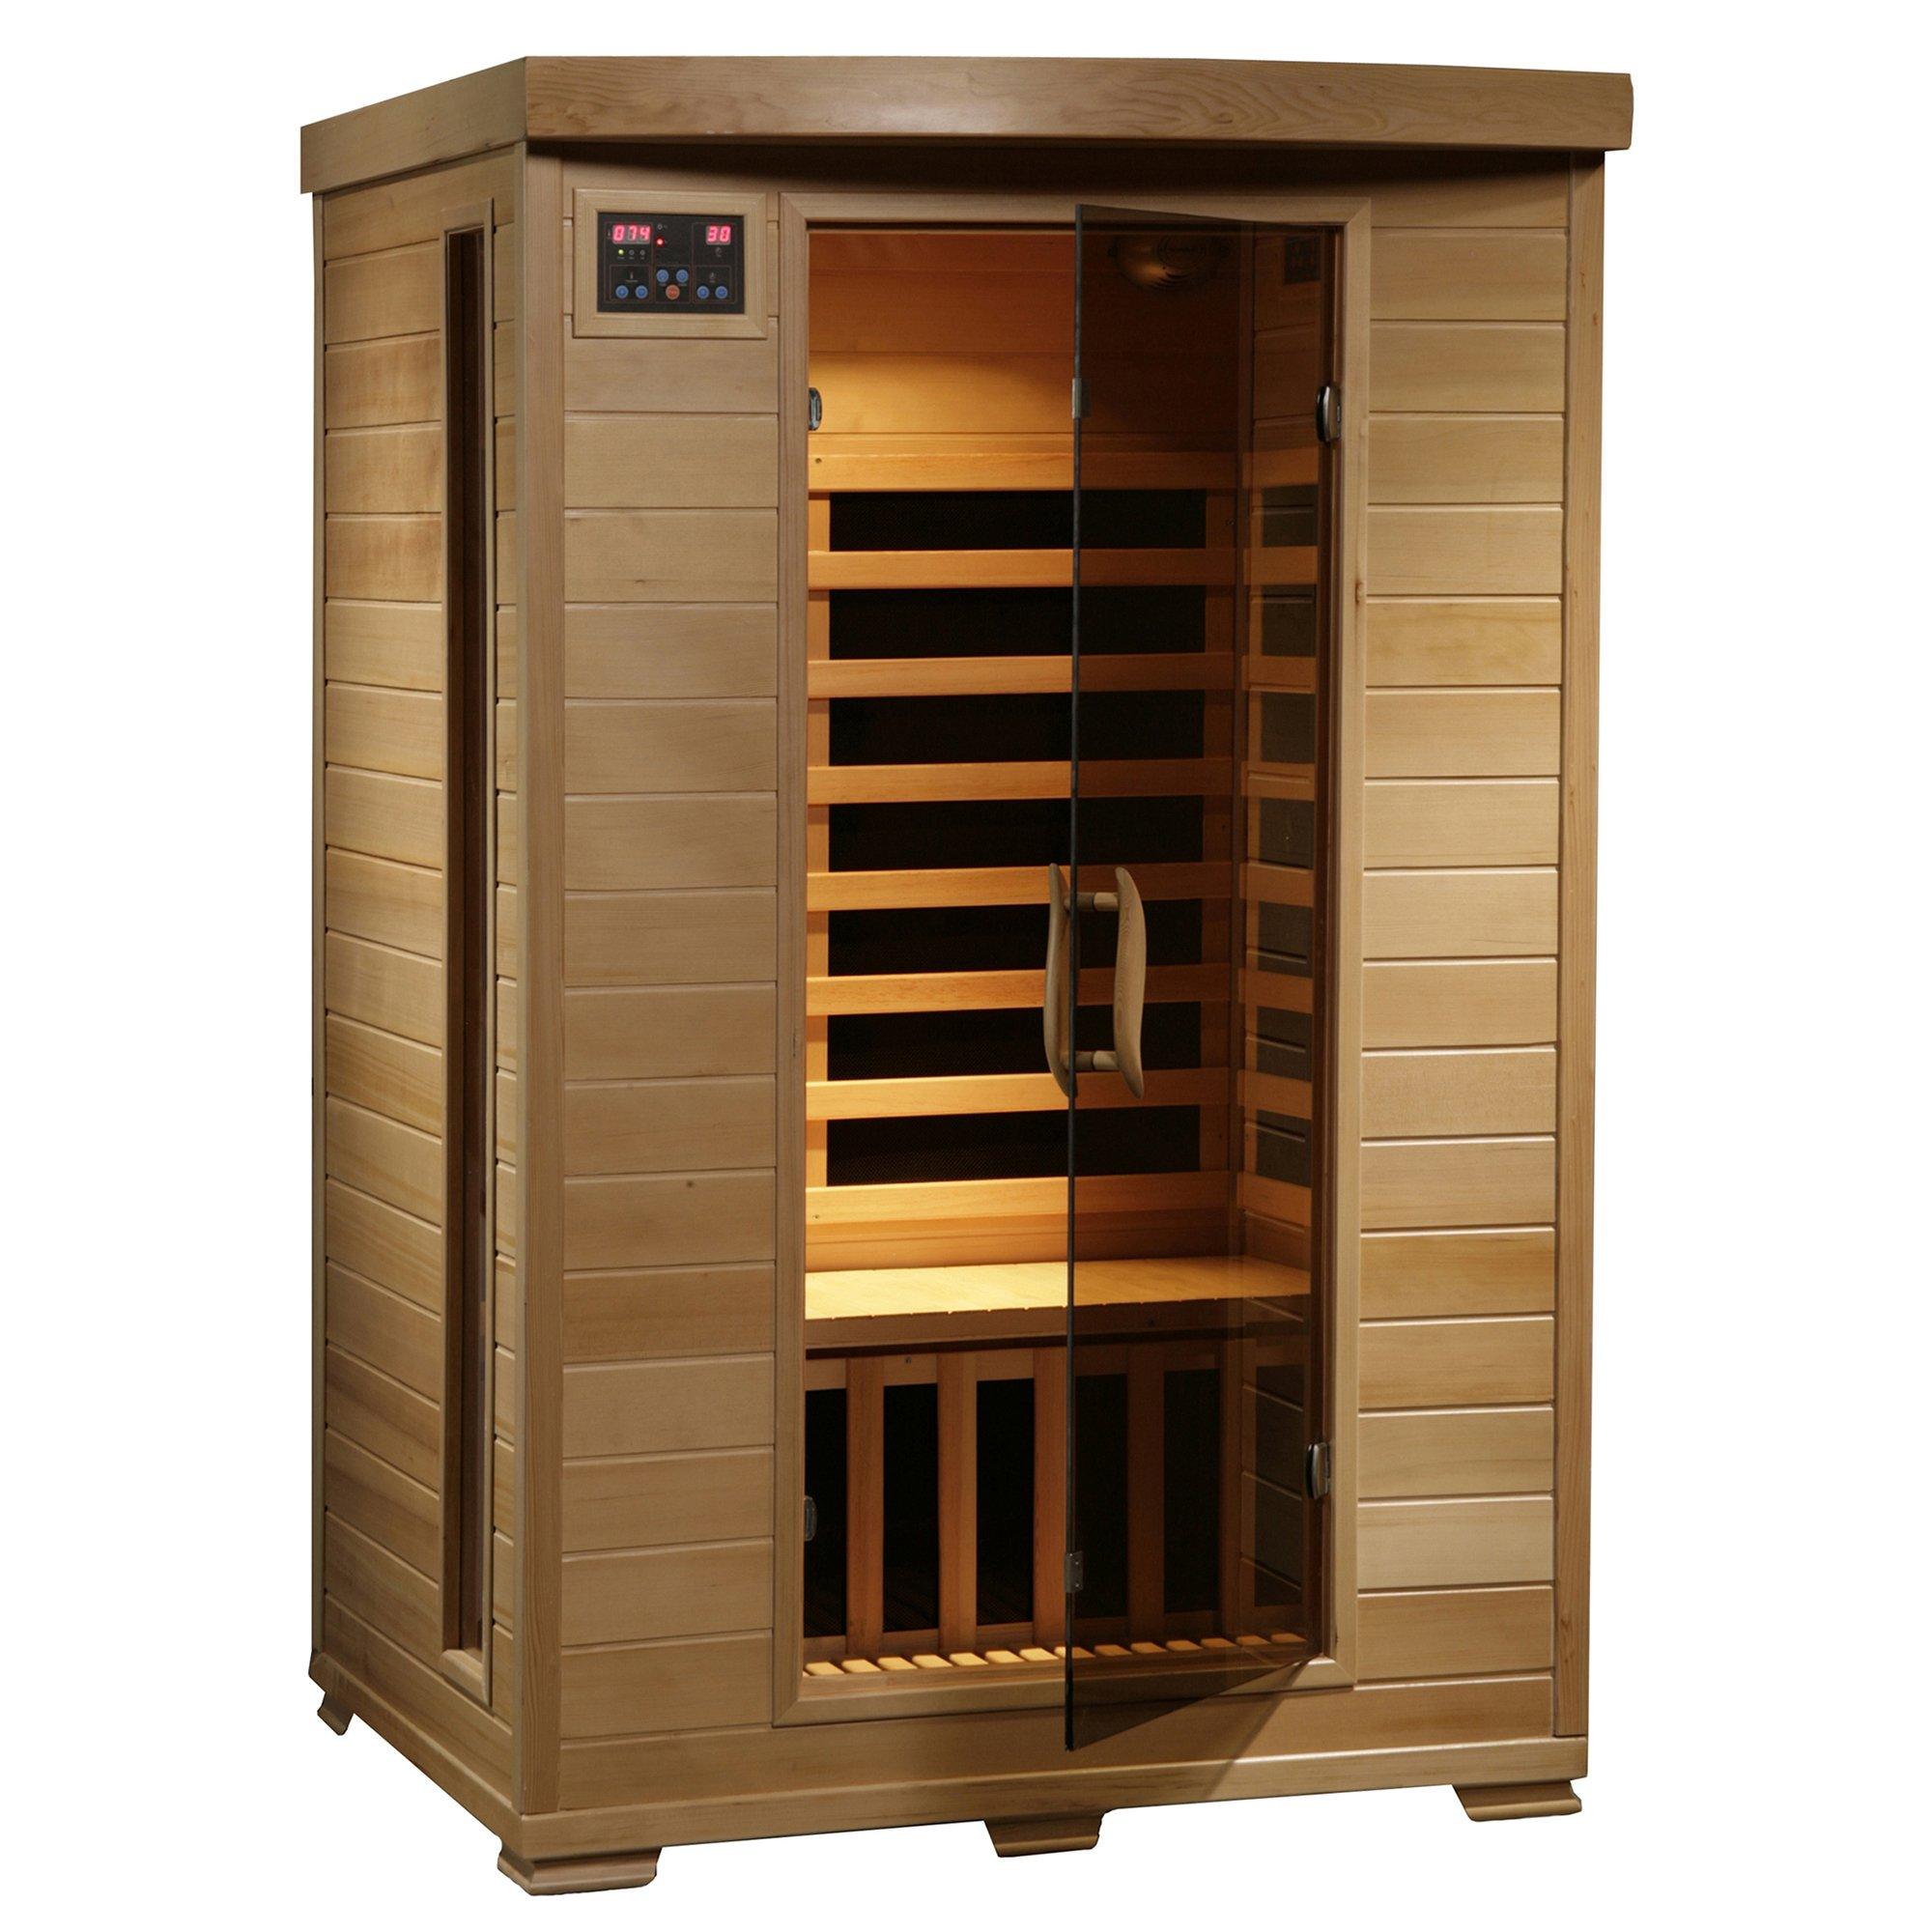 Self satisfaction in the sauna